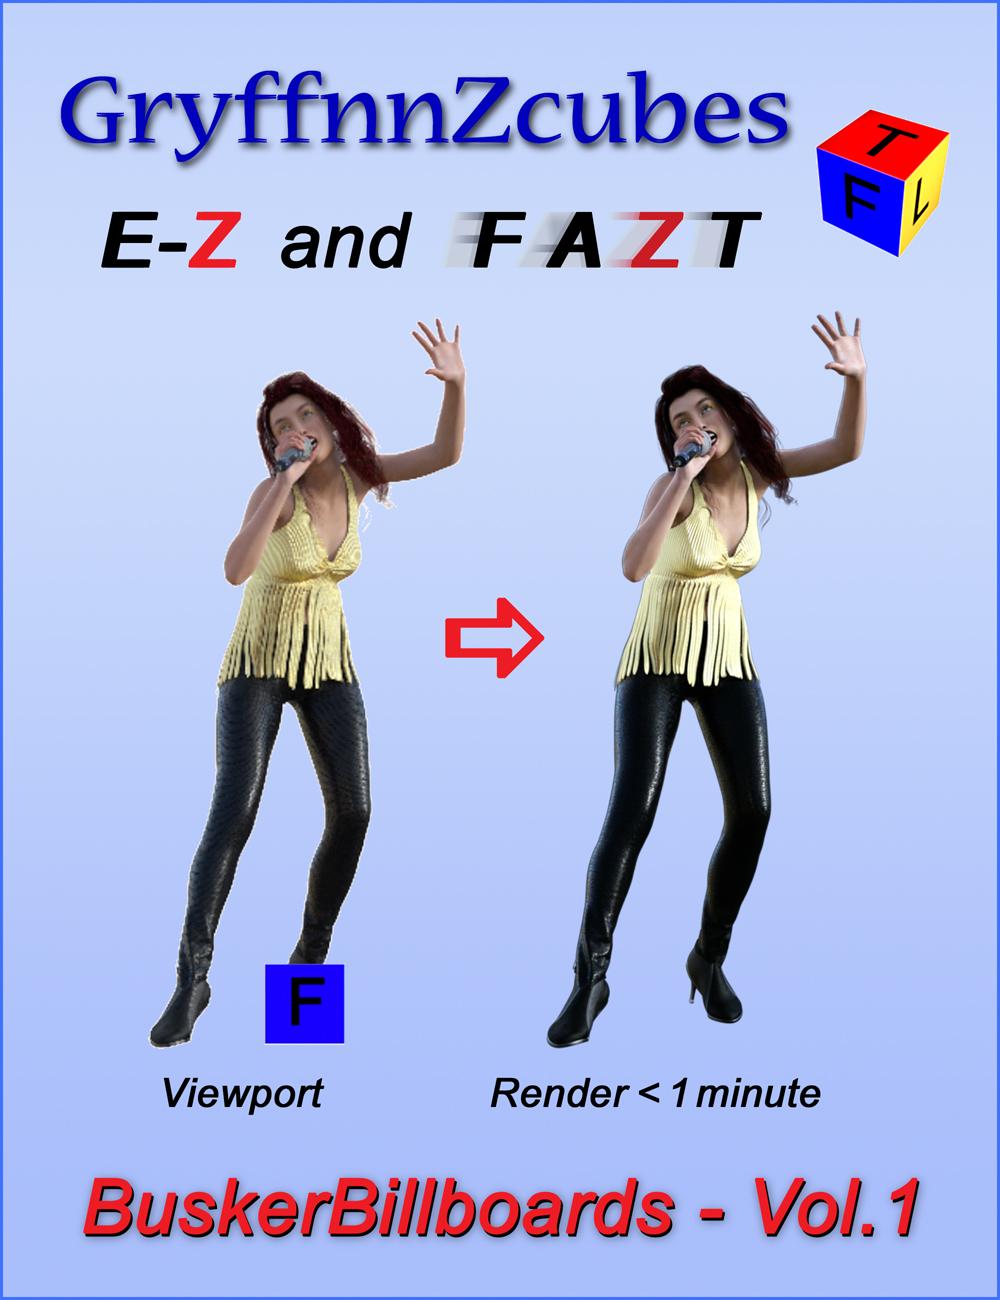 GryffnnZcube Busker Billboards - Volume 1 by: gryffnn / Elisa Griffin, 3D Models by Daz 3D